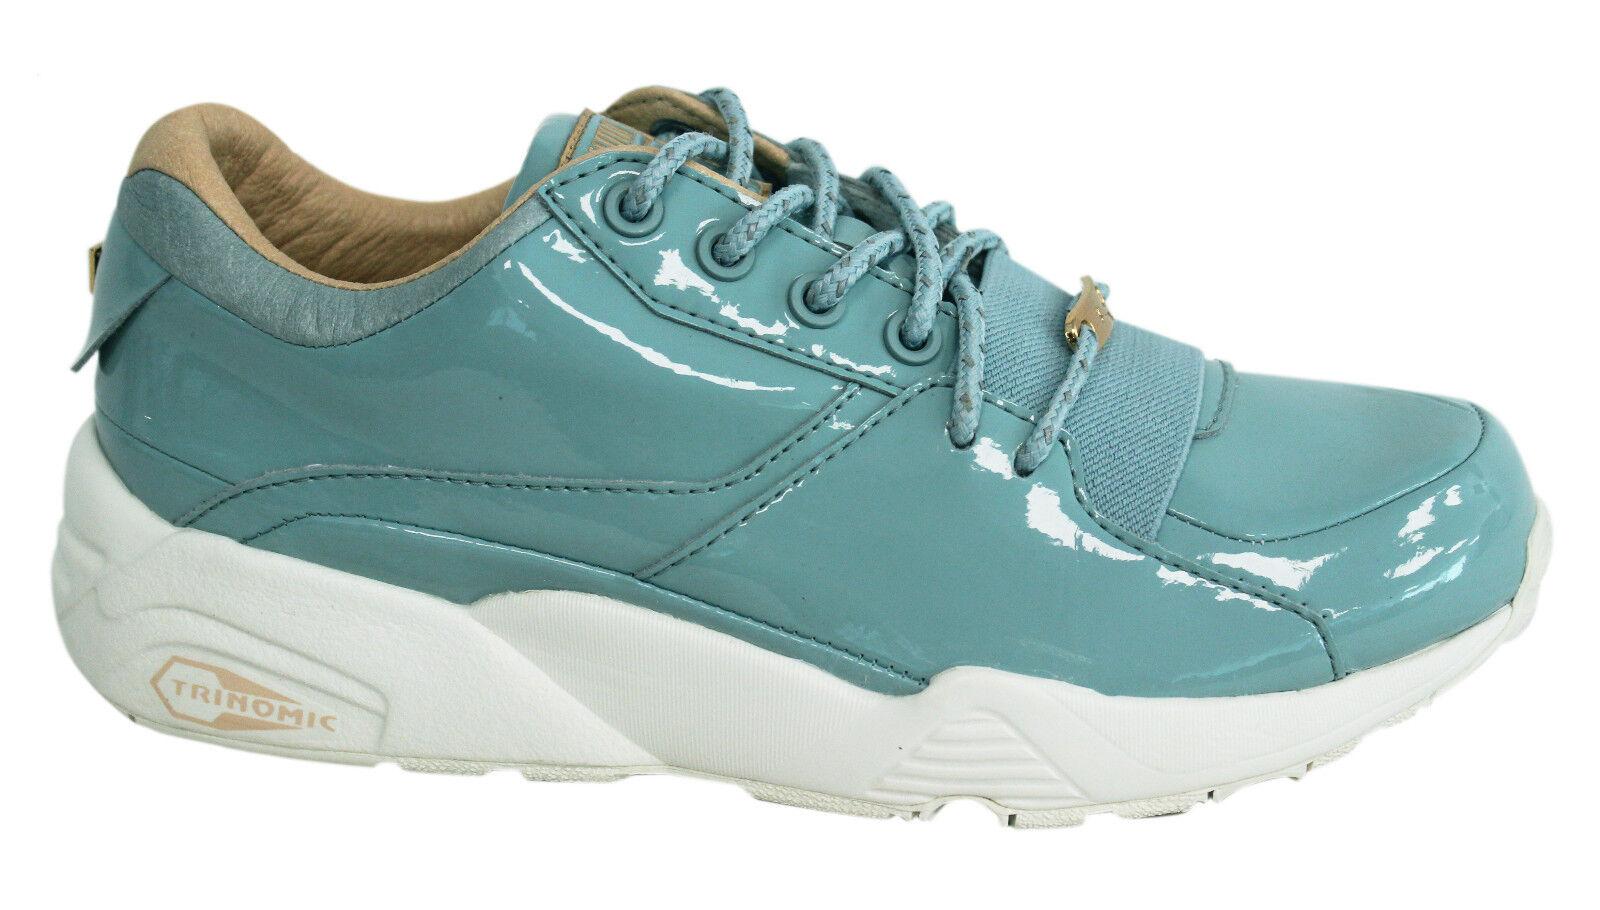 Femmes Chaussures Puma Femmes R698 Patent Nude Slate 362274 02